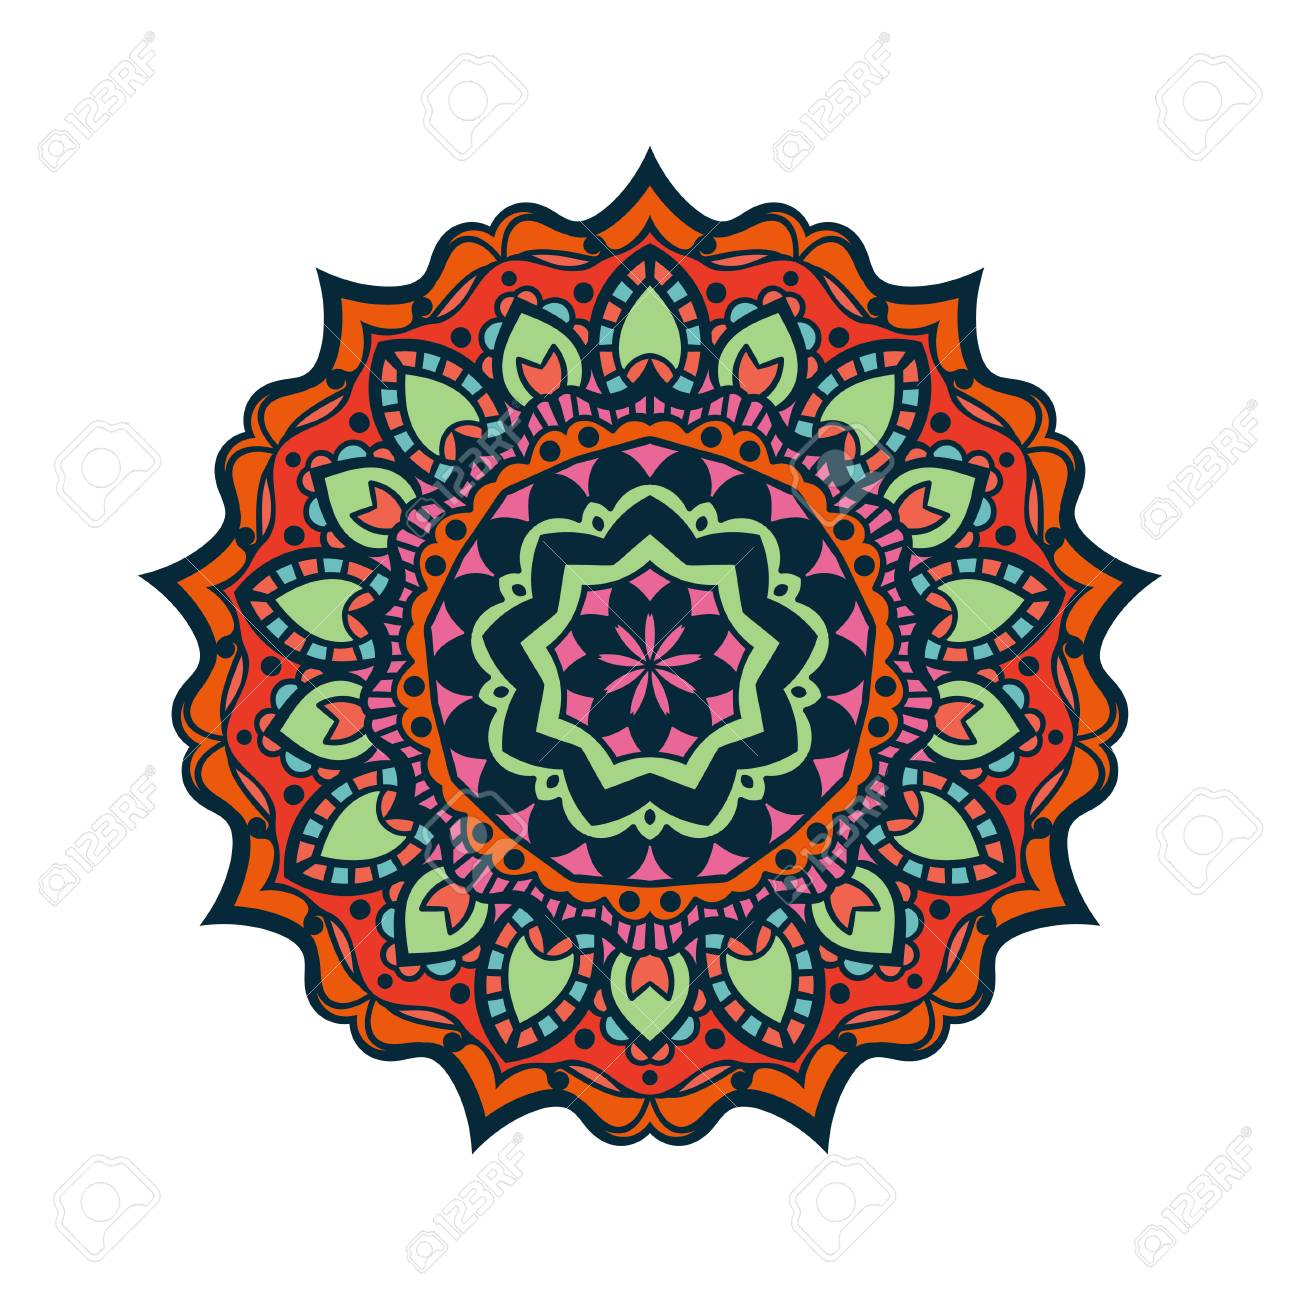 Flower Colored Ornamental Decorative Mandala Vintage Design Element Coloring Book Page Islam